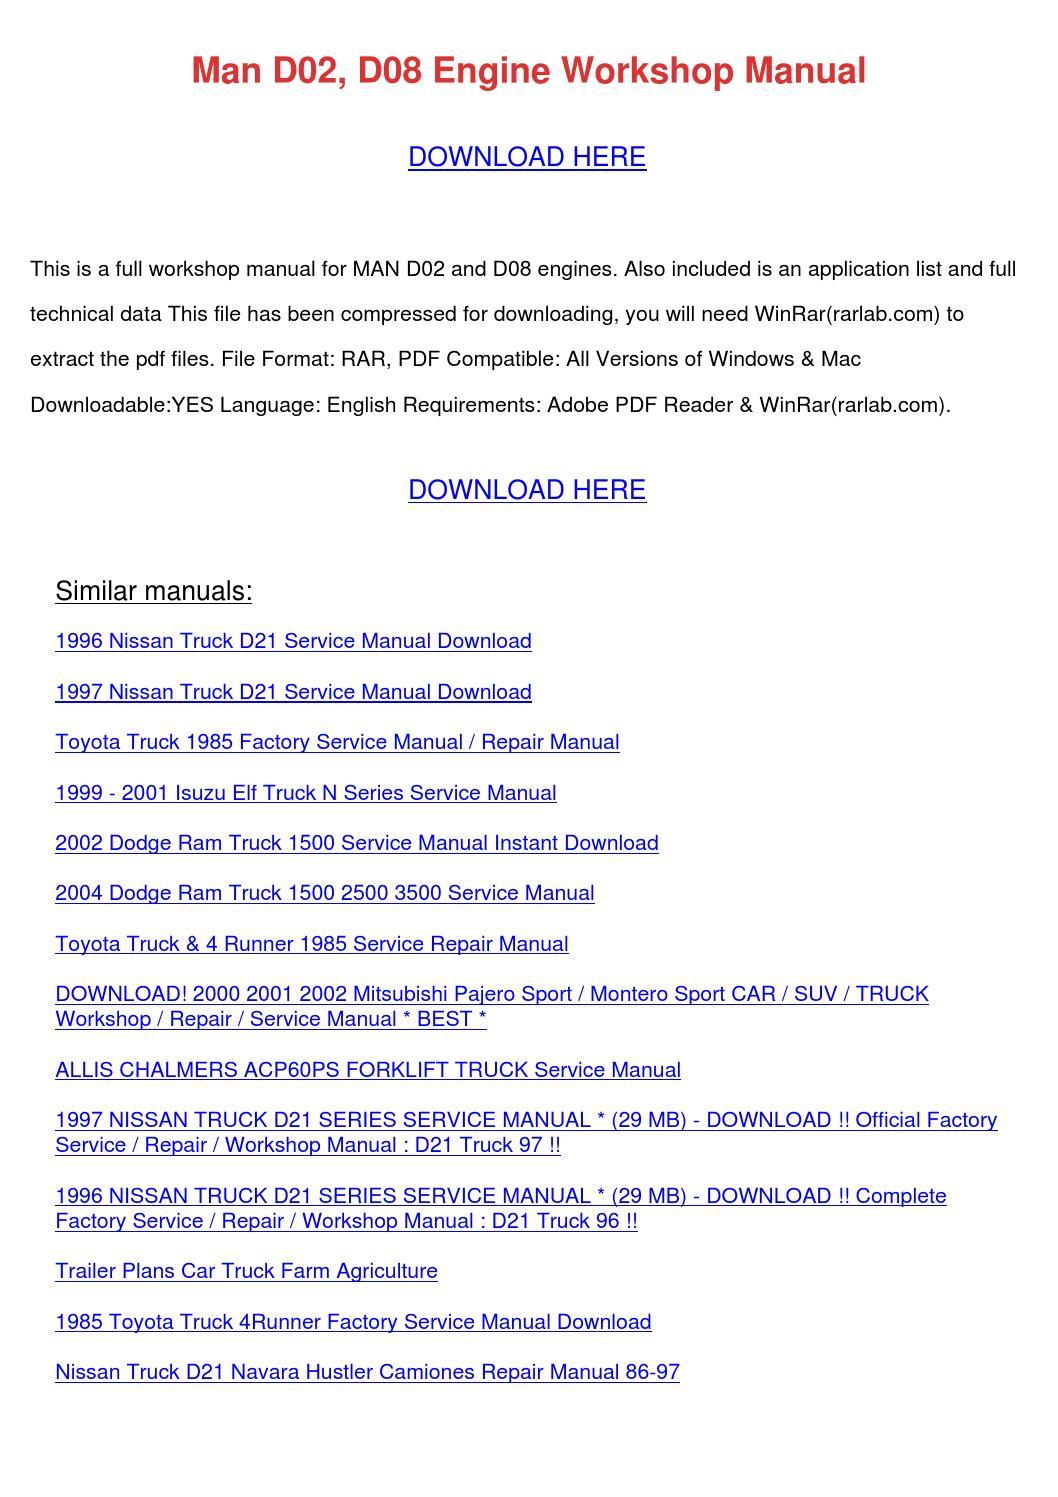 man d02 d08 engine workshop manual by karolhutcherson issuu rh issuu com Dodge  Ram 1500 Manual Book Dodge Viper Manual